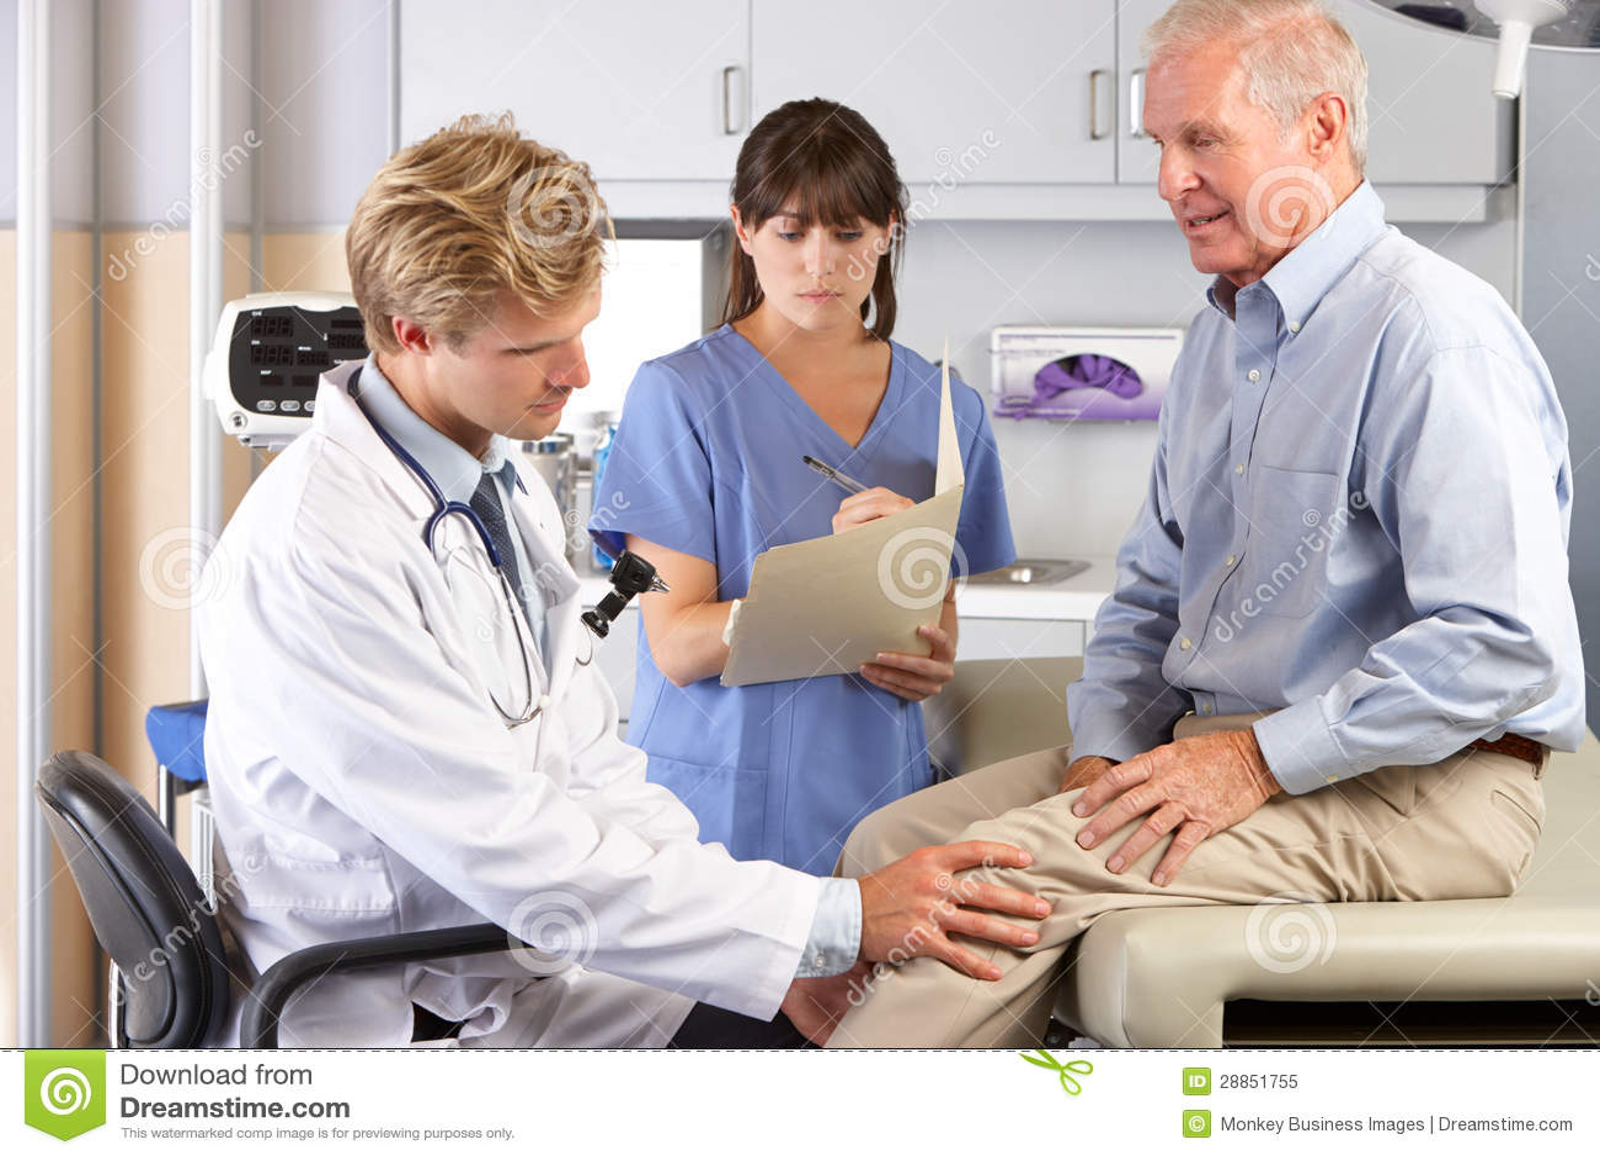 Dolore del ginocchio del dottore Examining Male Patient With